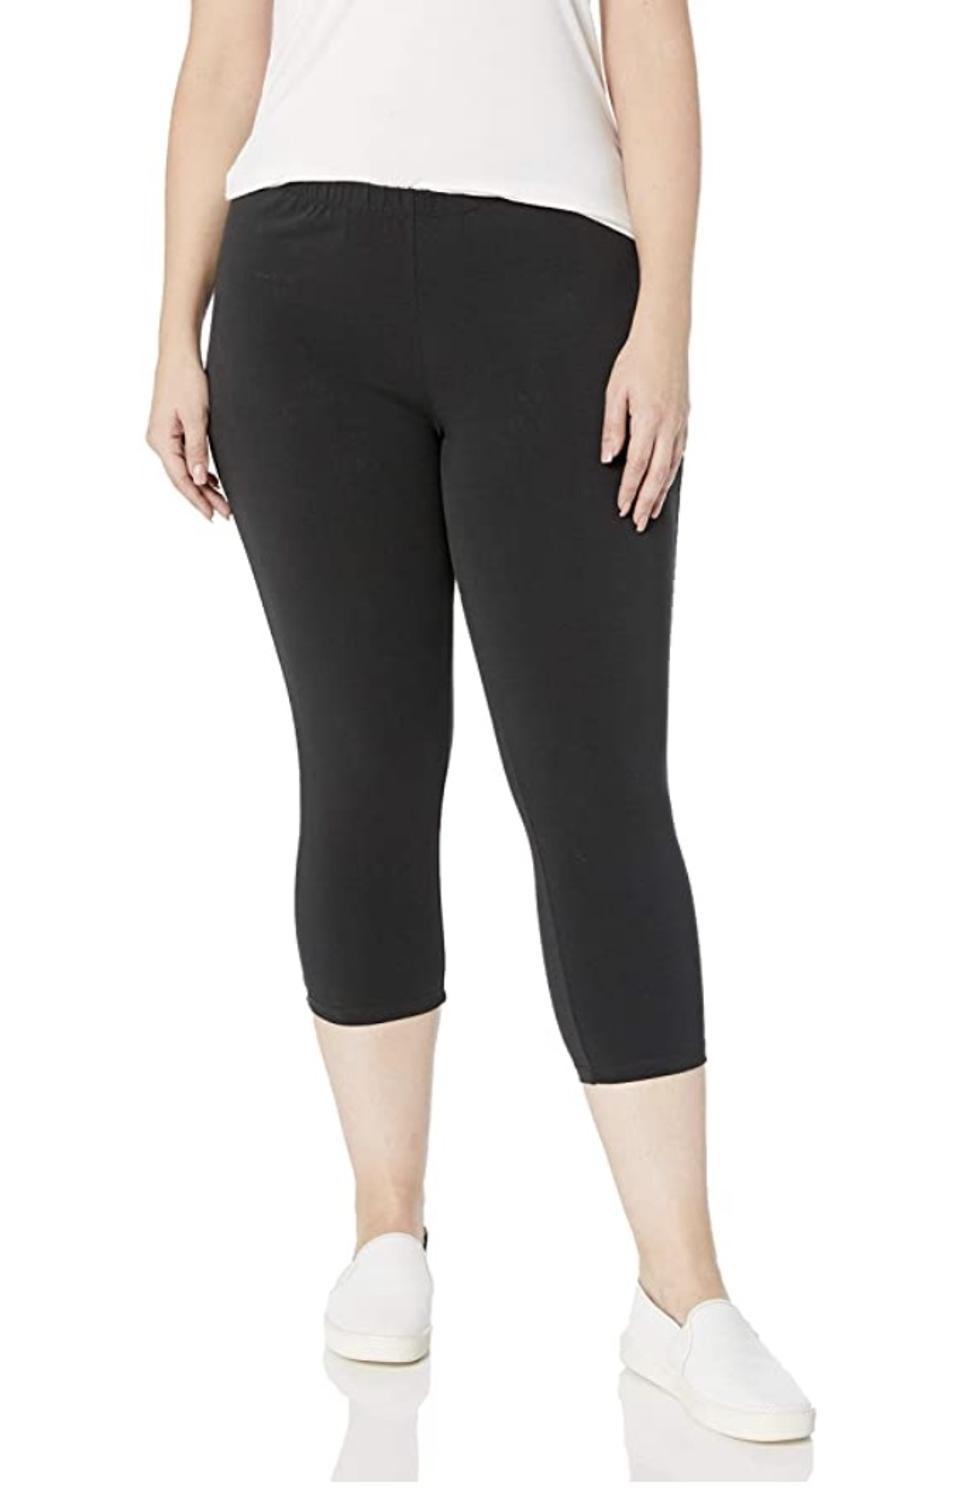 Just My Size Plus-Size Stretch Jersey Capri Leggings